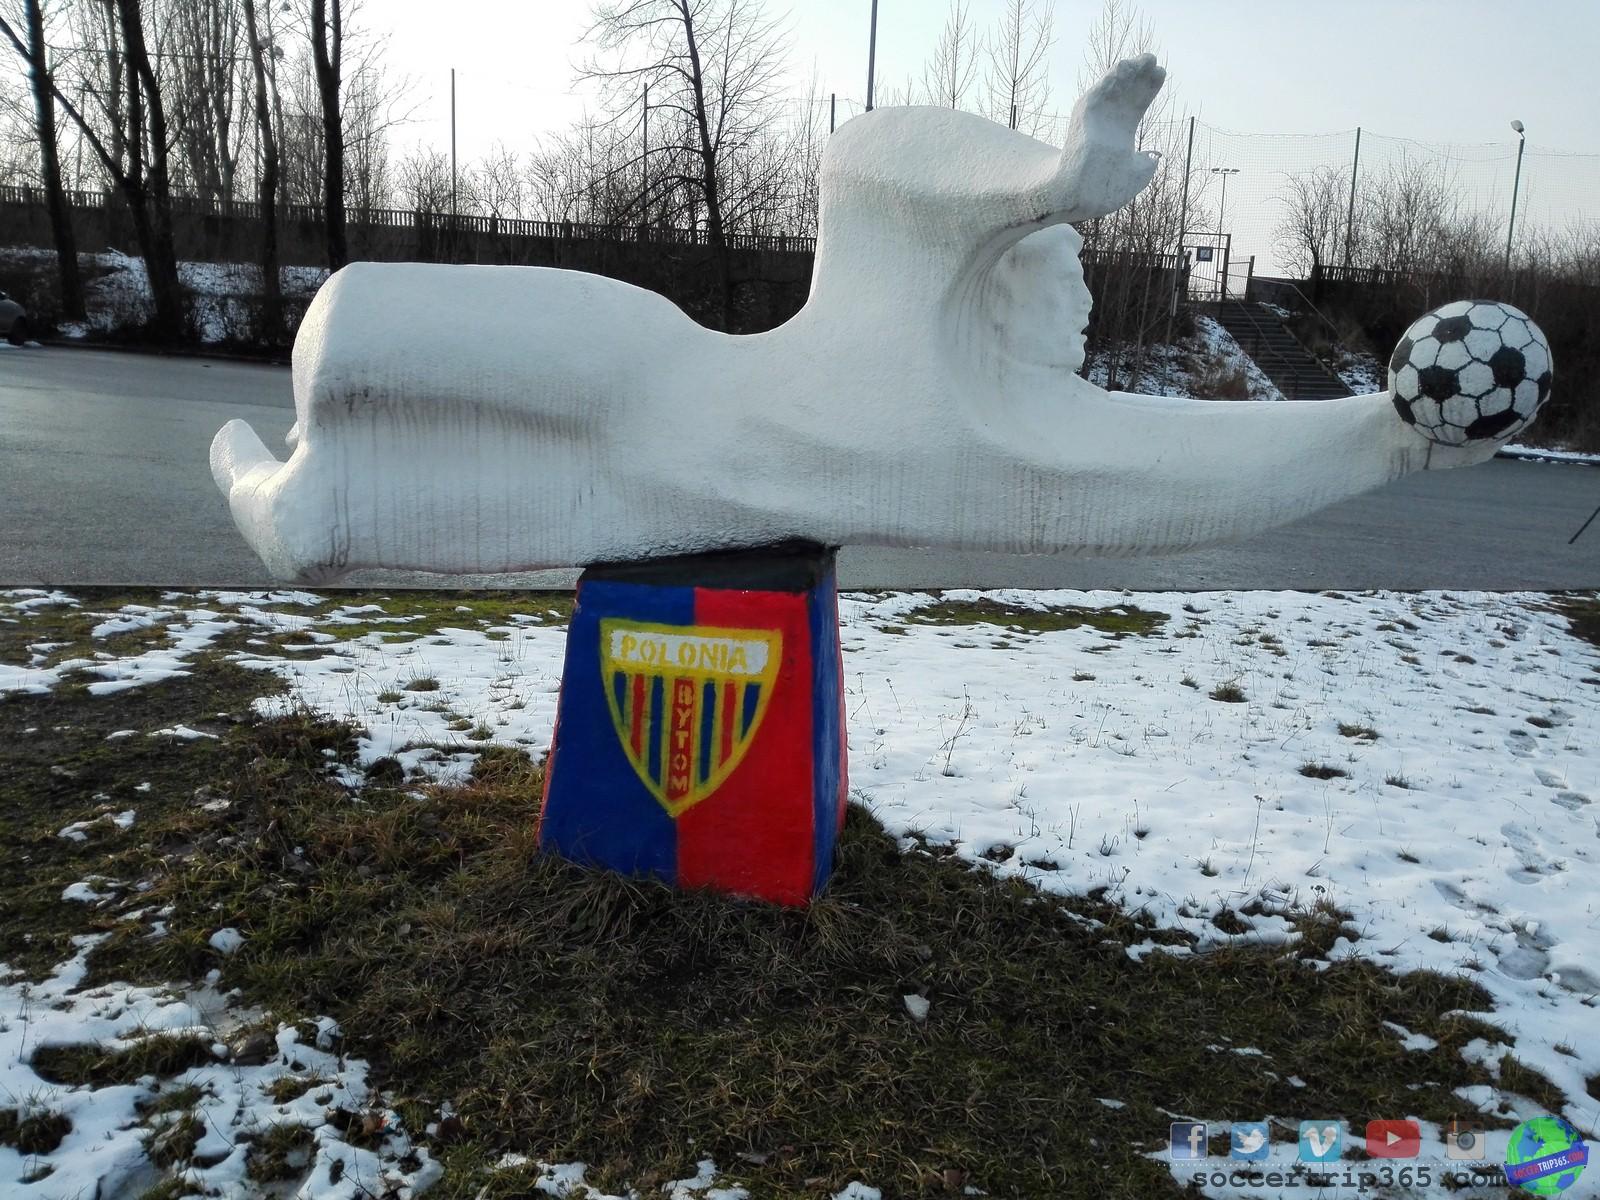 ŚląskiTrip by Soccertrip365